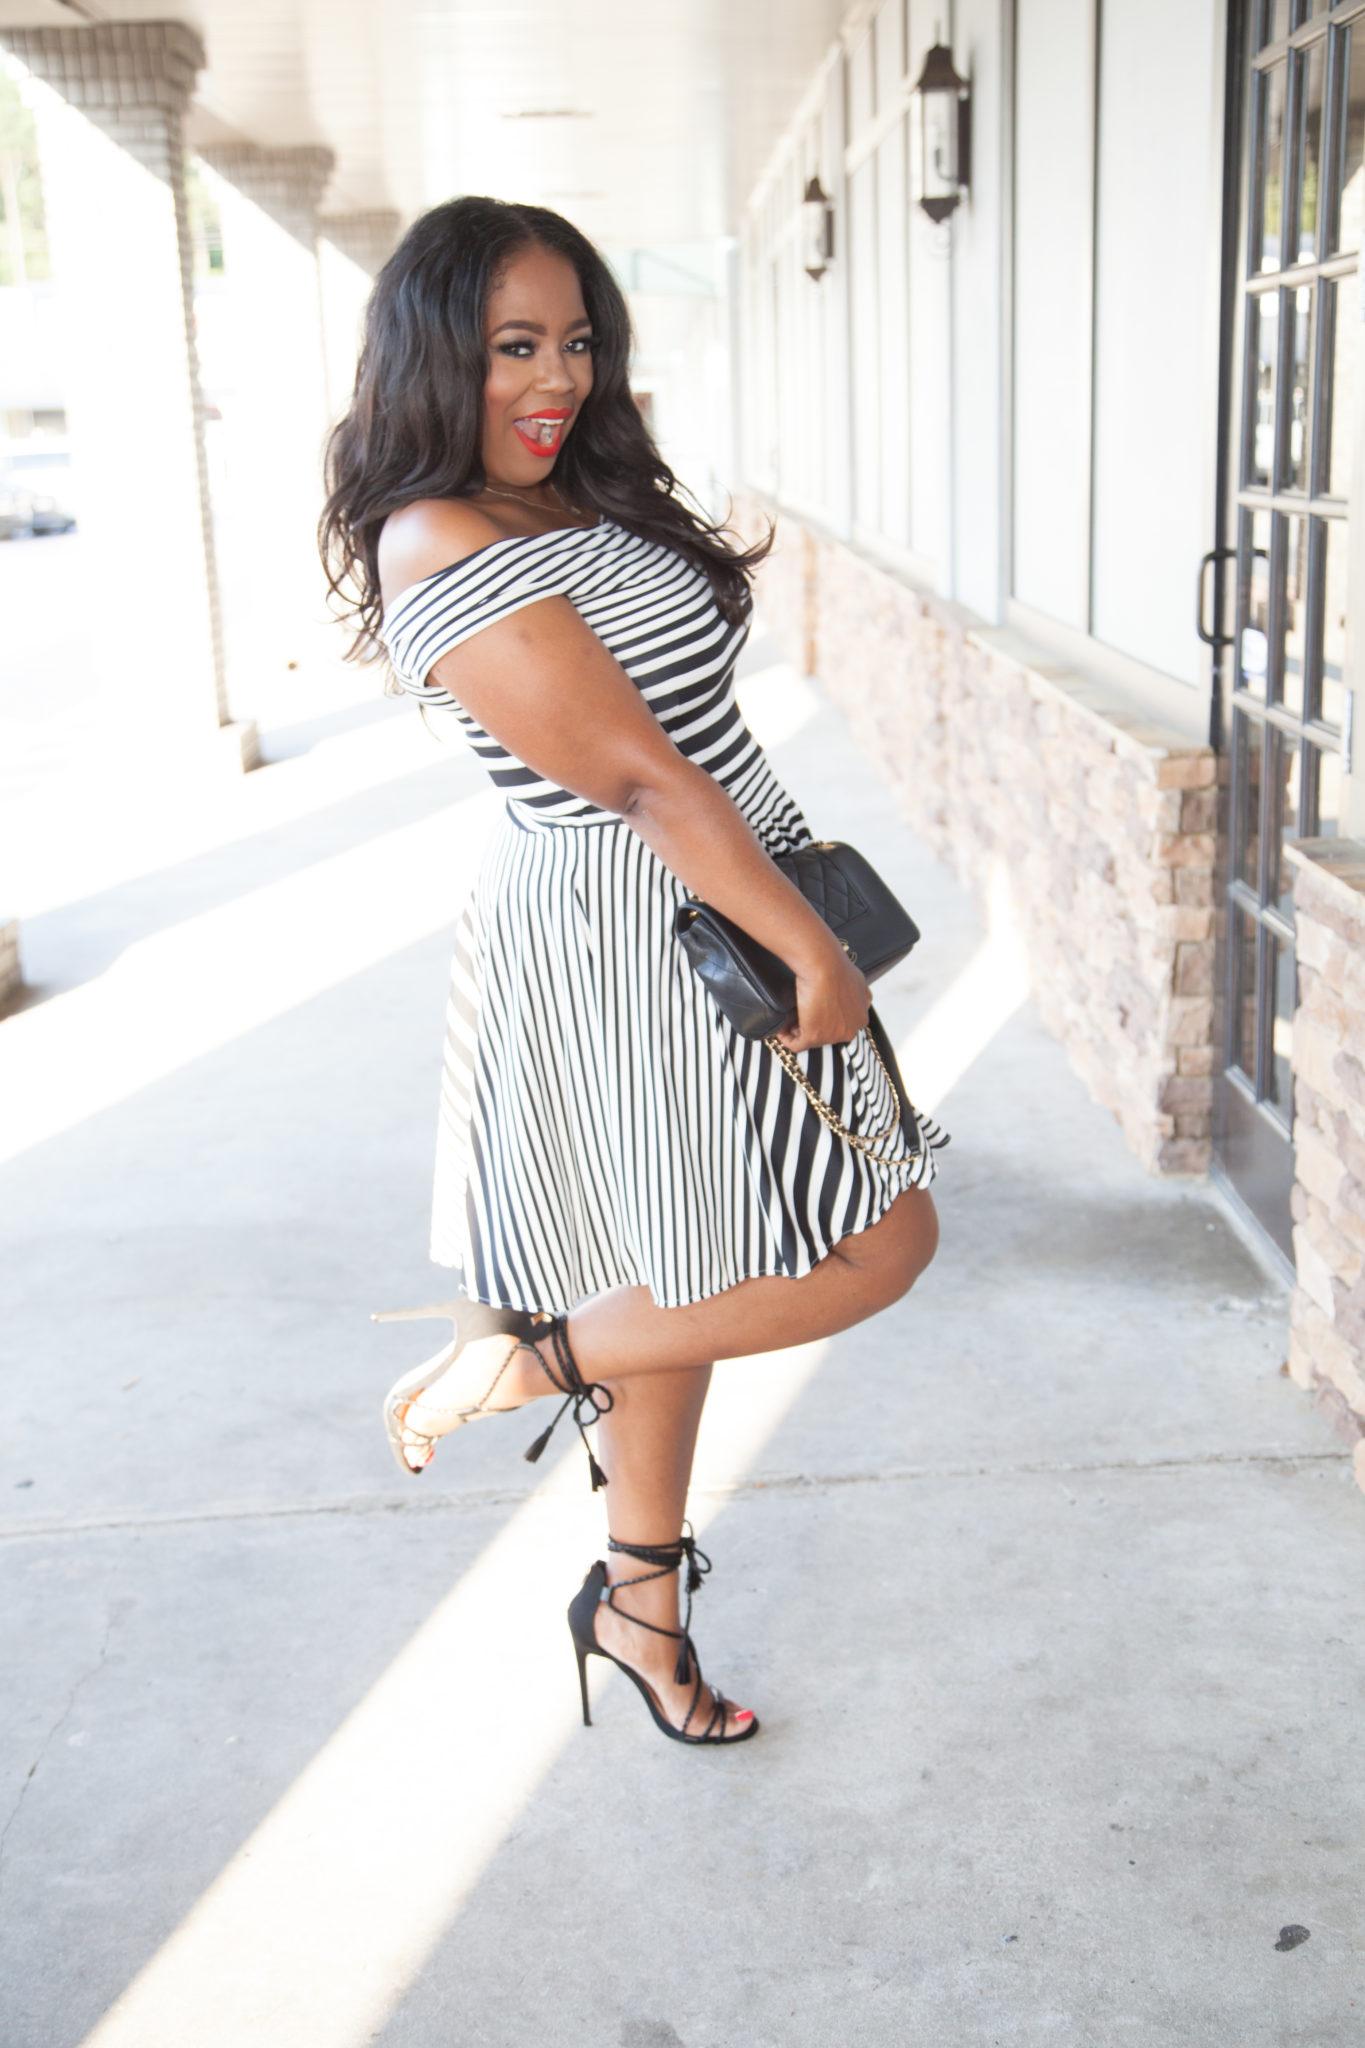 My Style: Ennyluap 'Lynn Whitfield' Shoulder Dress